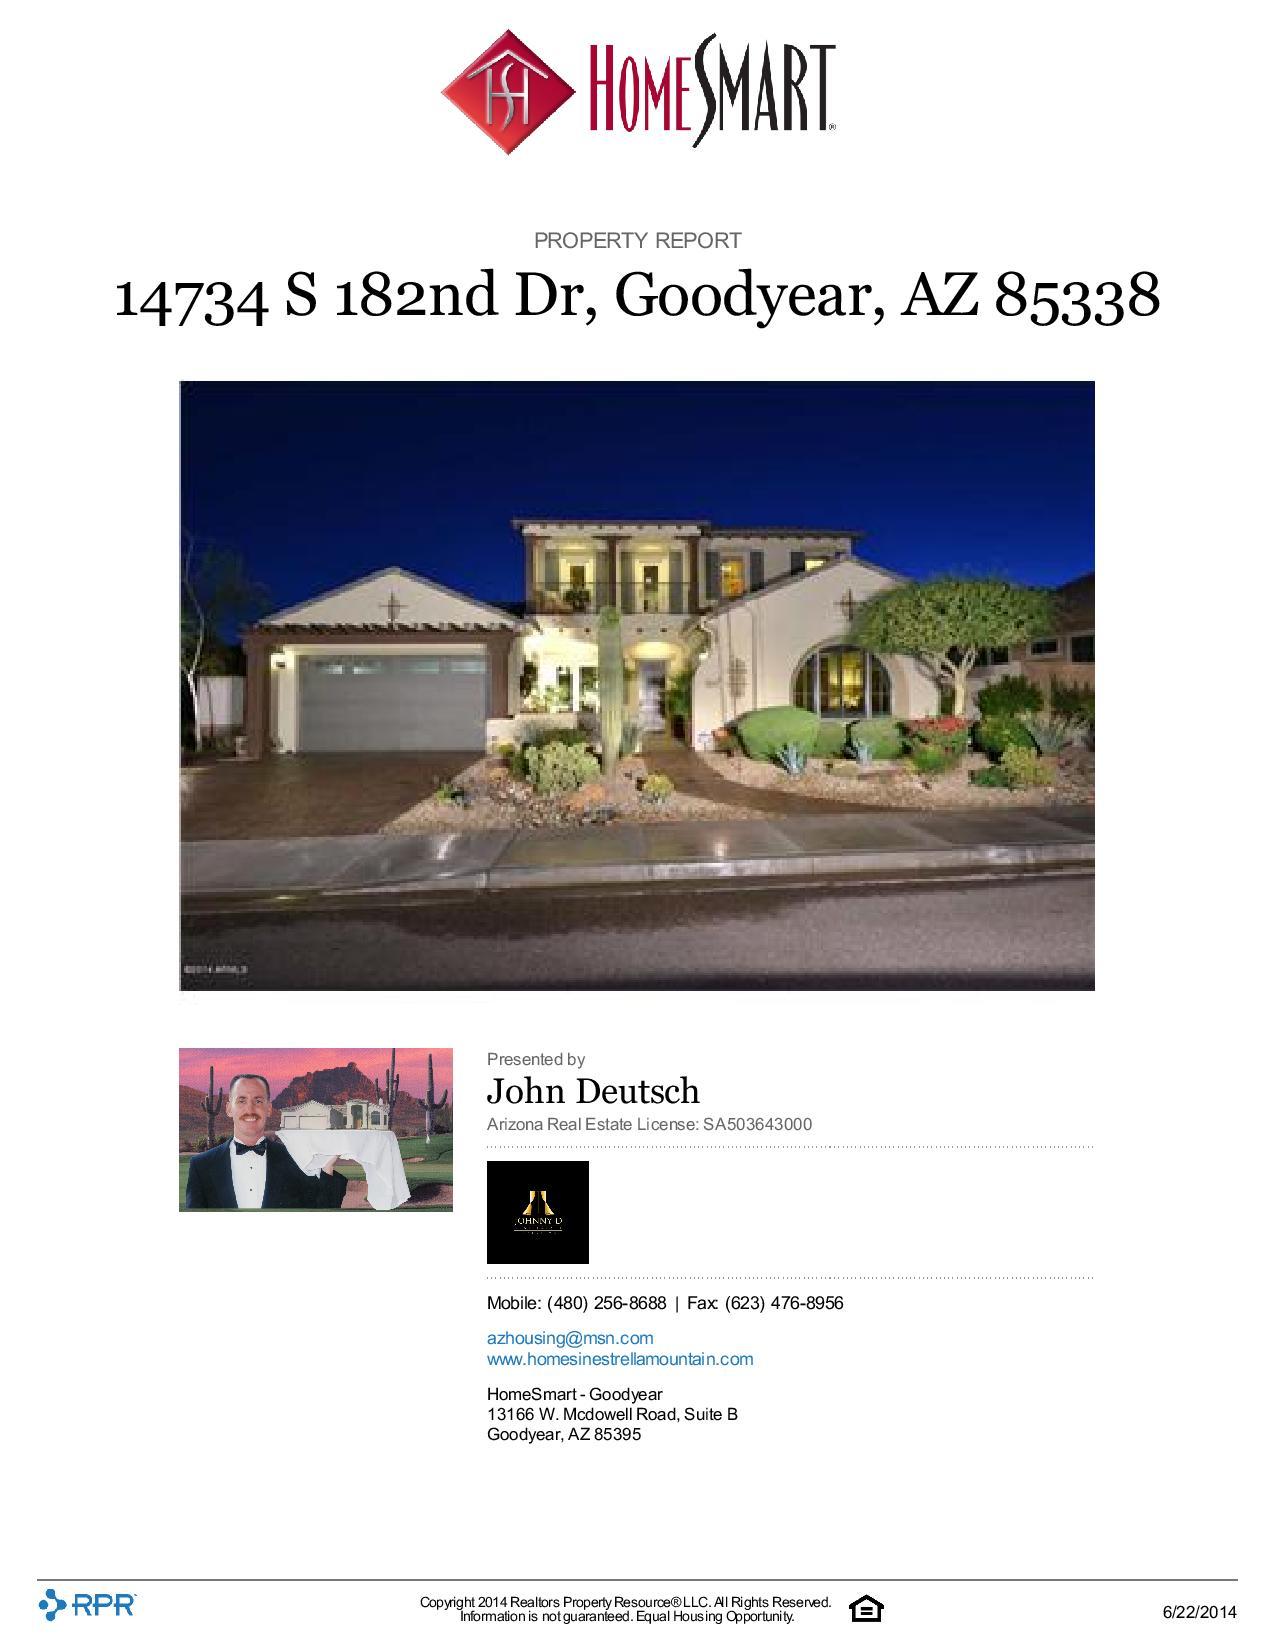 14734-S-182nd-Dr-Goodyear-AZ-85338-page-001